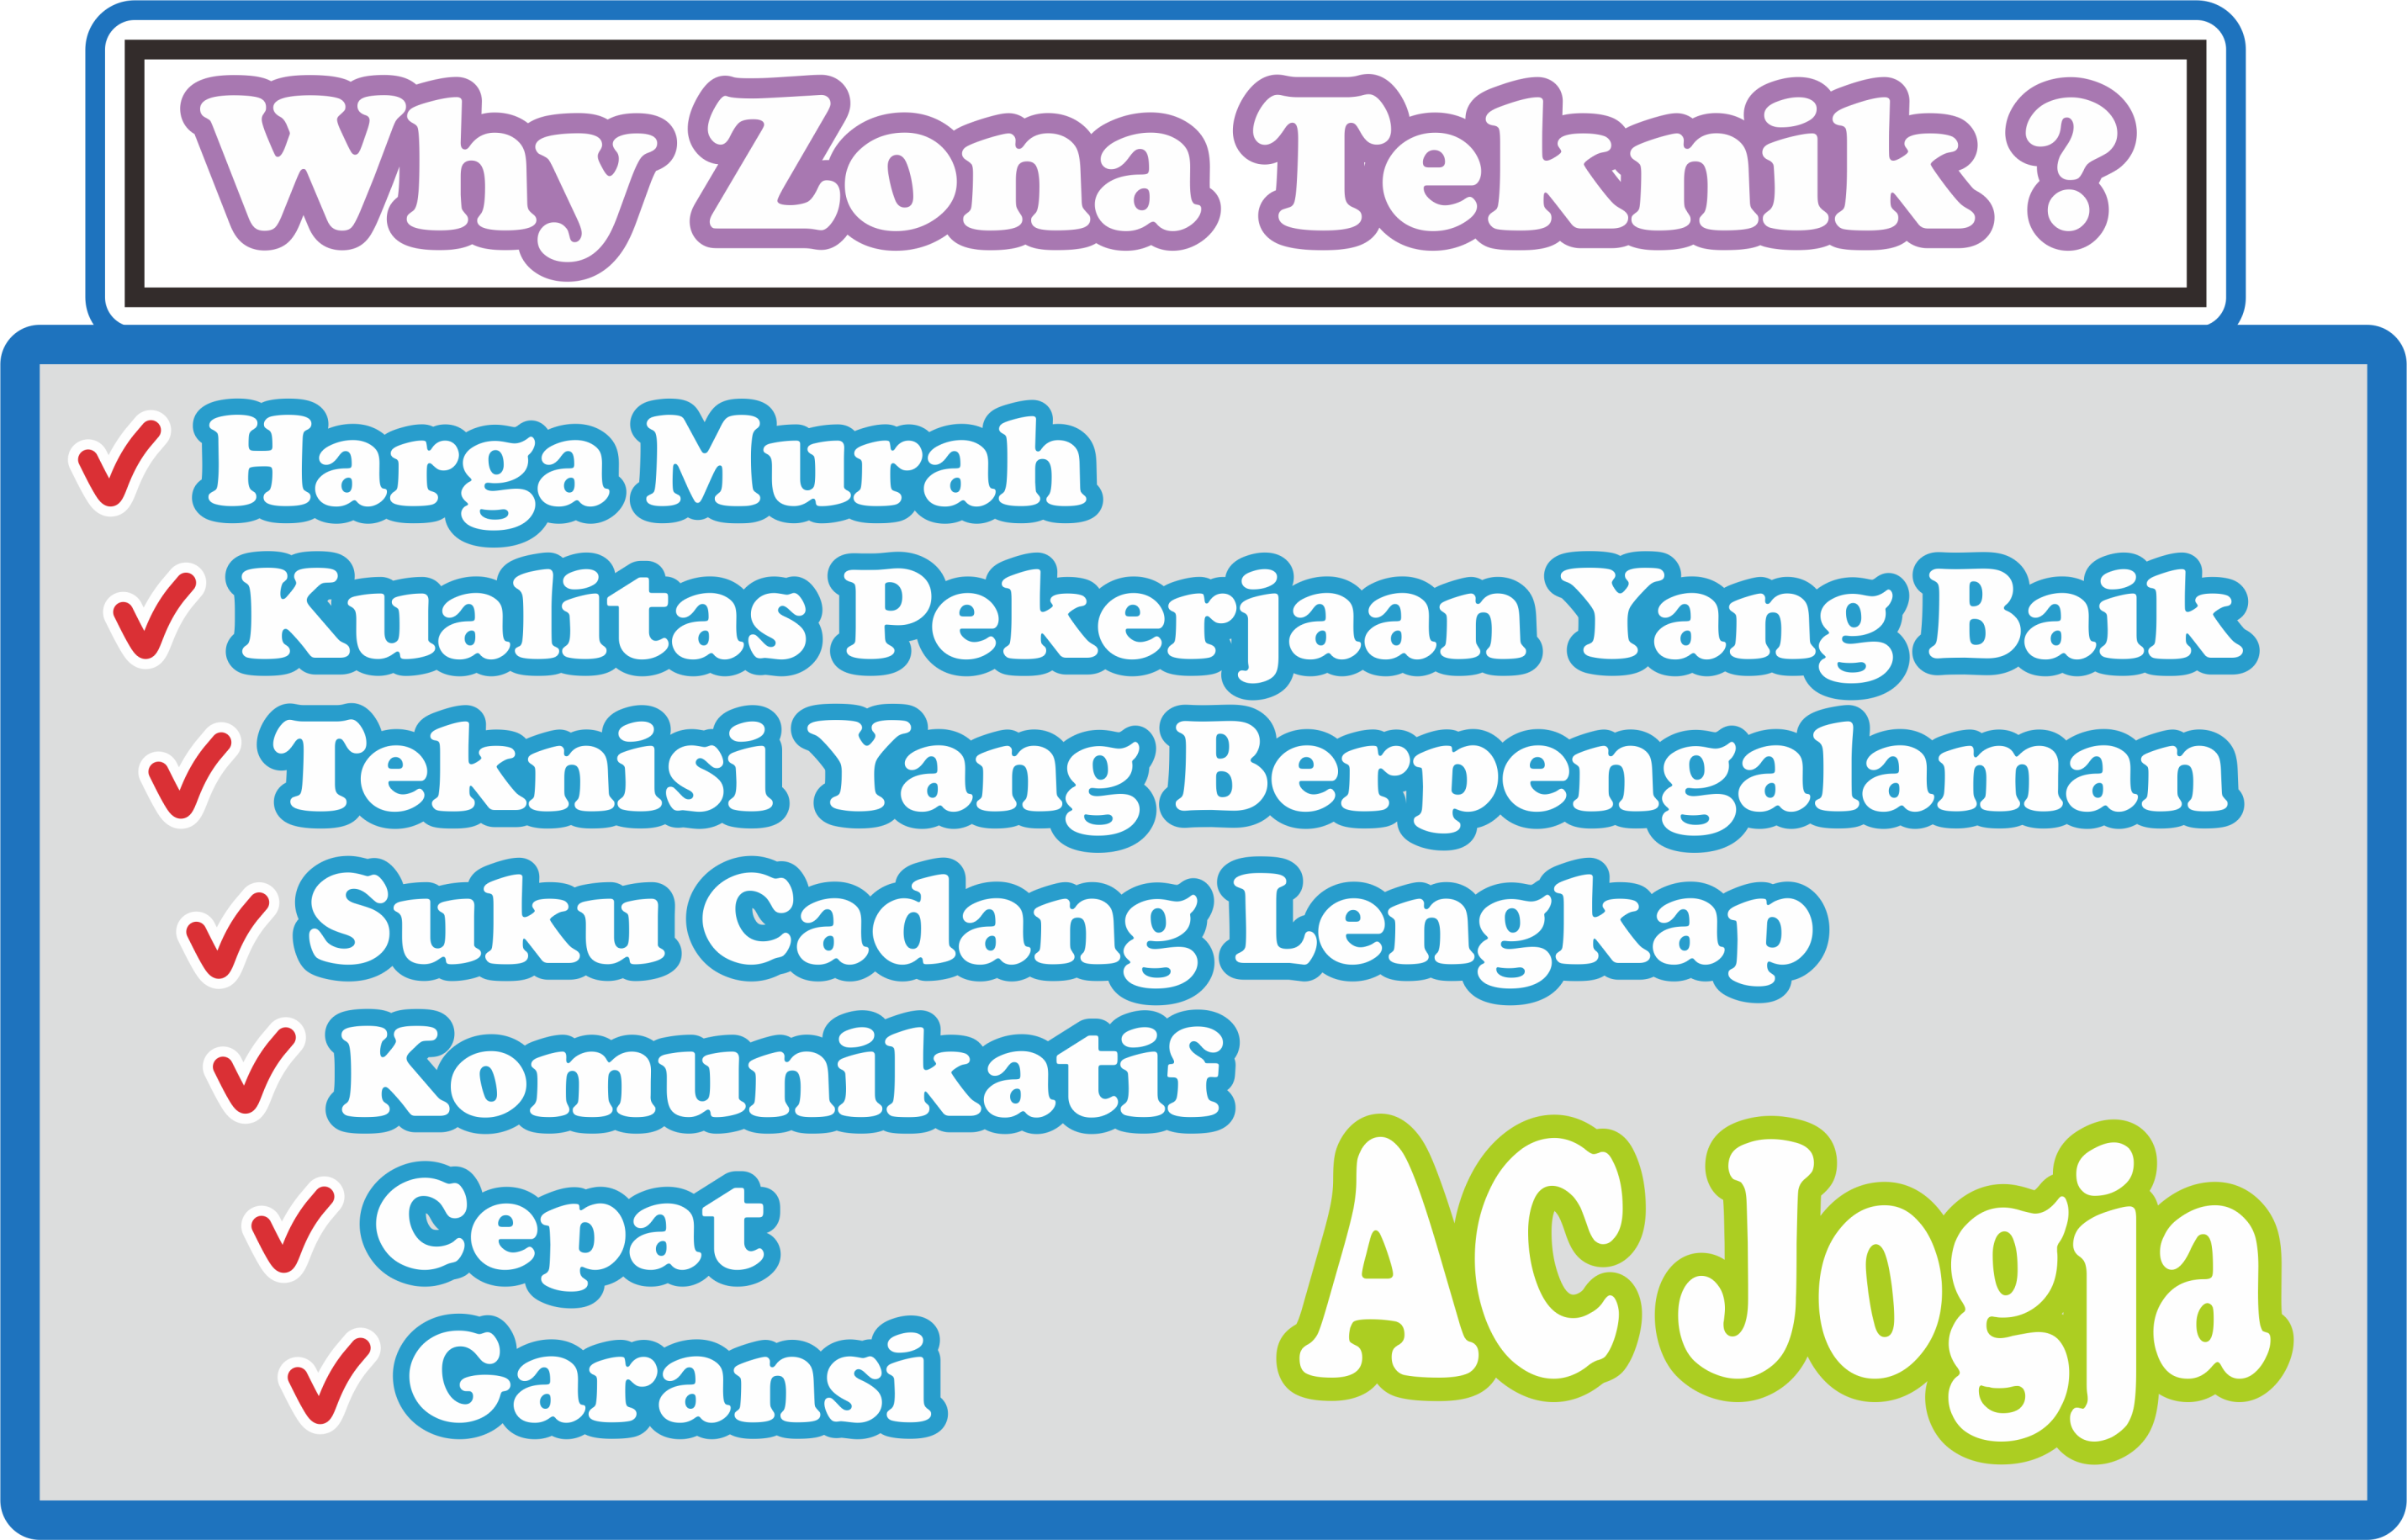 Why Zona Teknik Bengkel AC Jogja